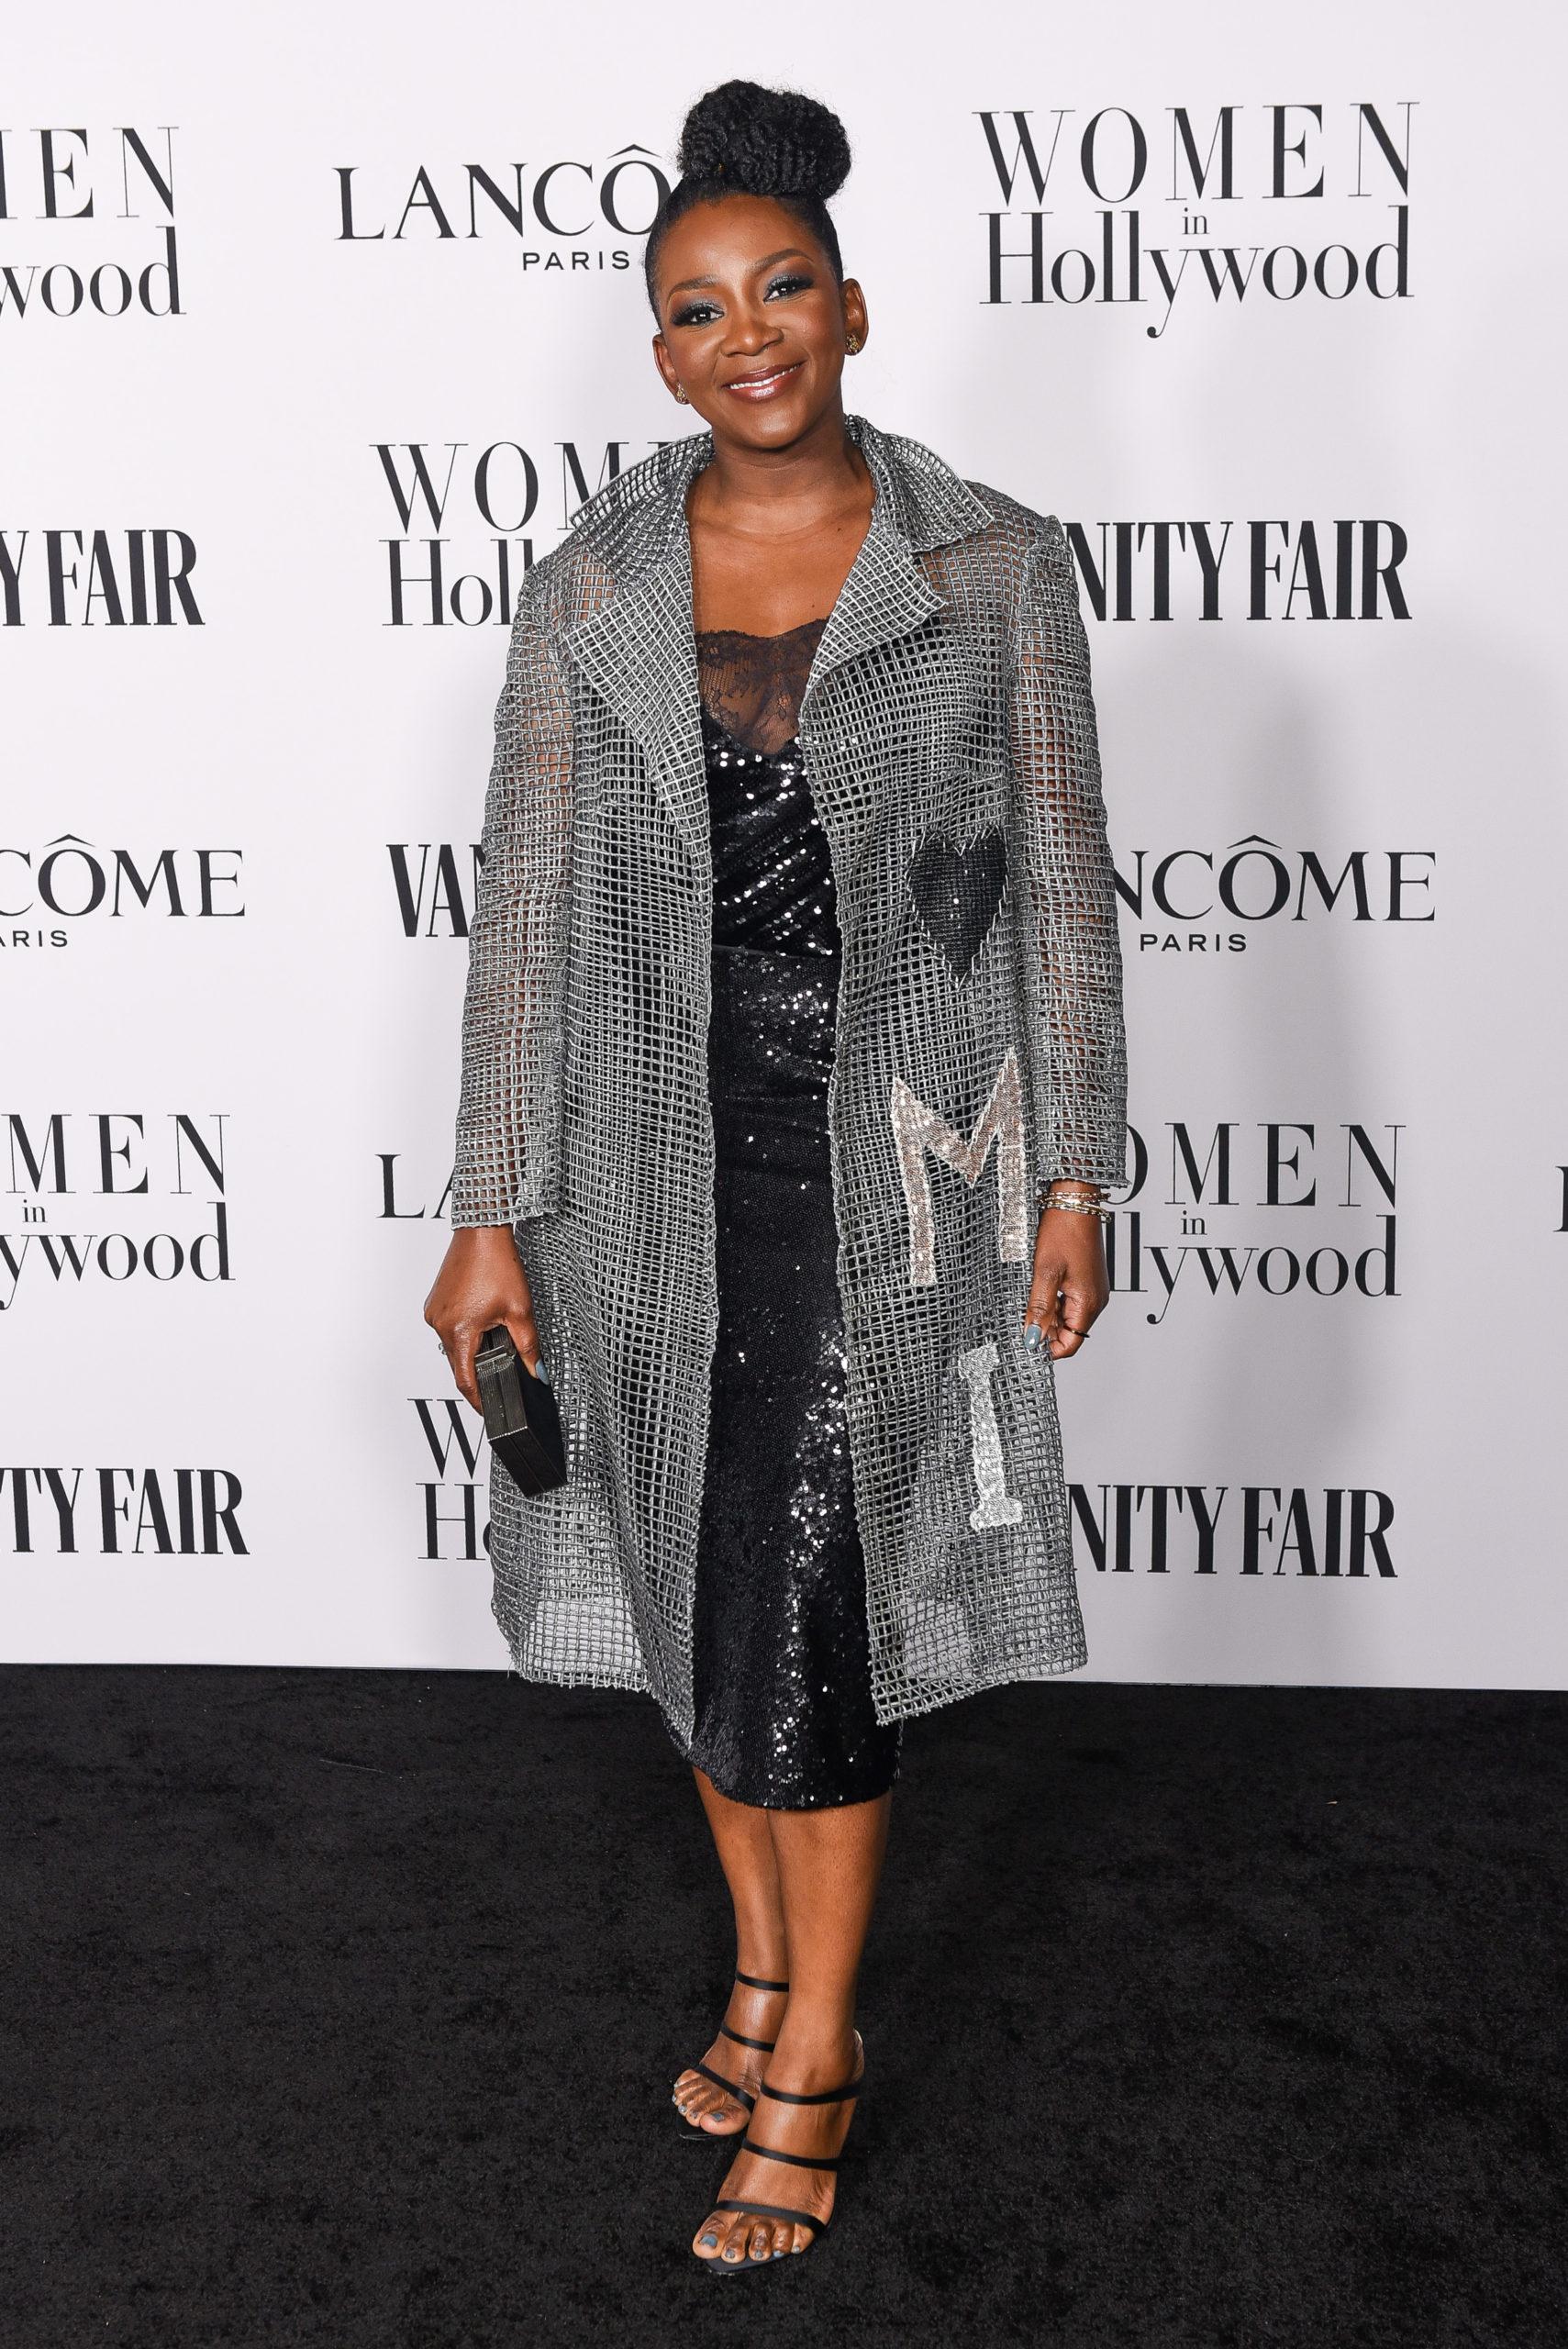 Genevieve Nnaji had an Eventful Week in Hollywood | Let's Take You Through